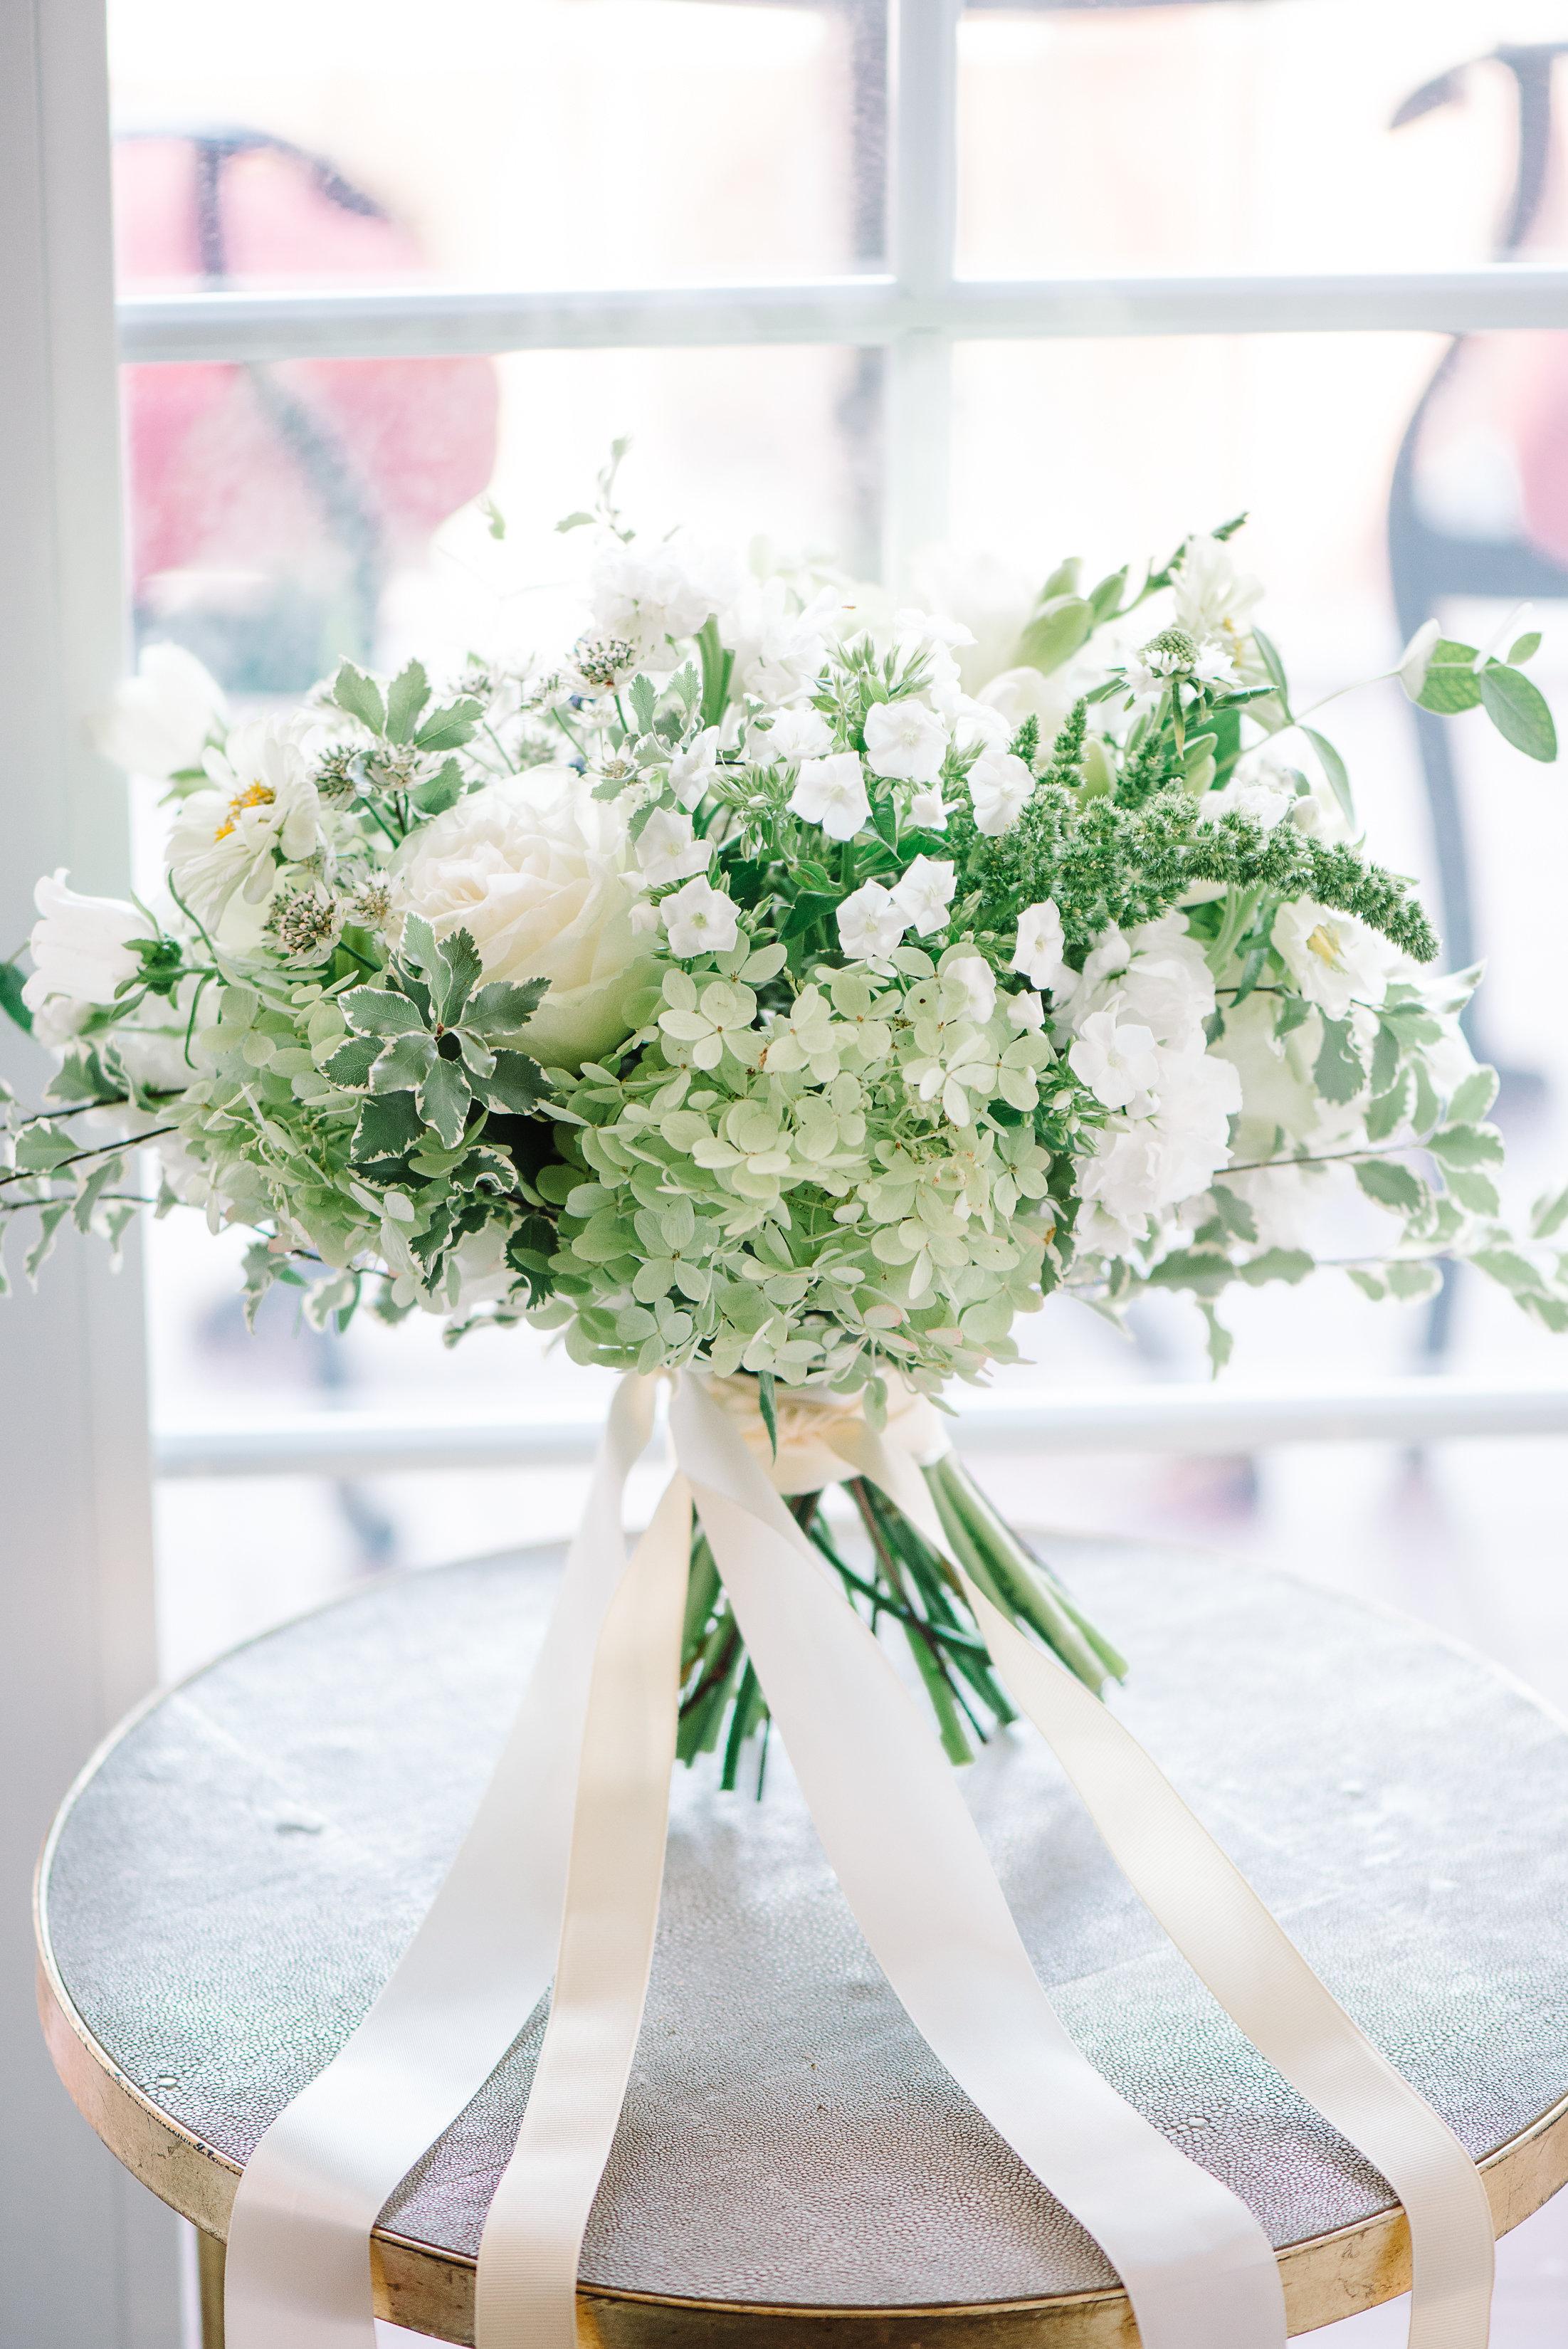 NormanPhotoPaper_SuttonSimila_Wedding-37.jpg